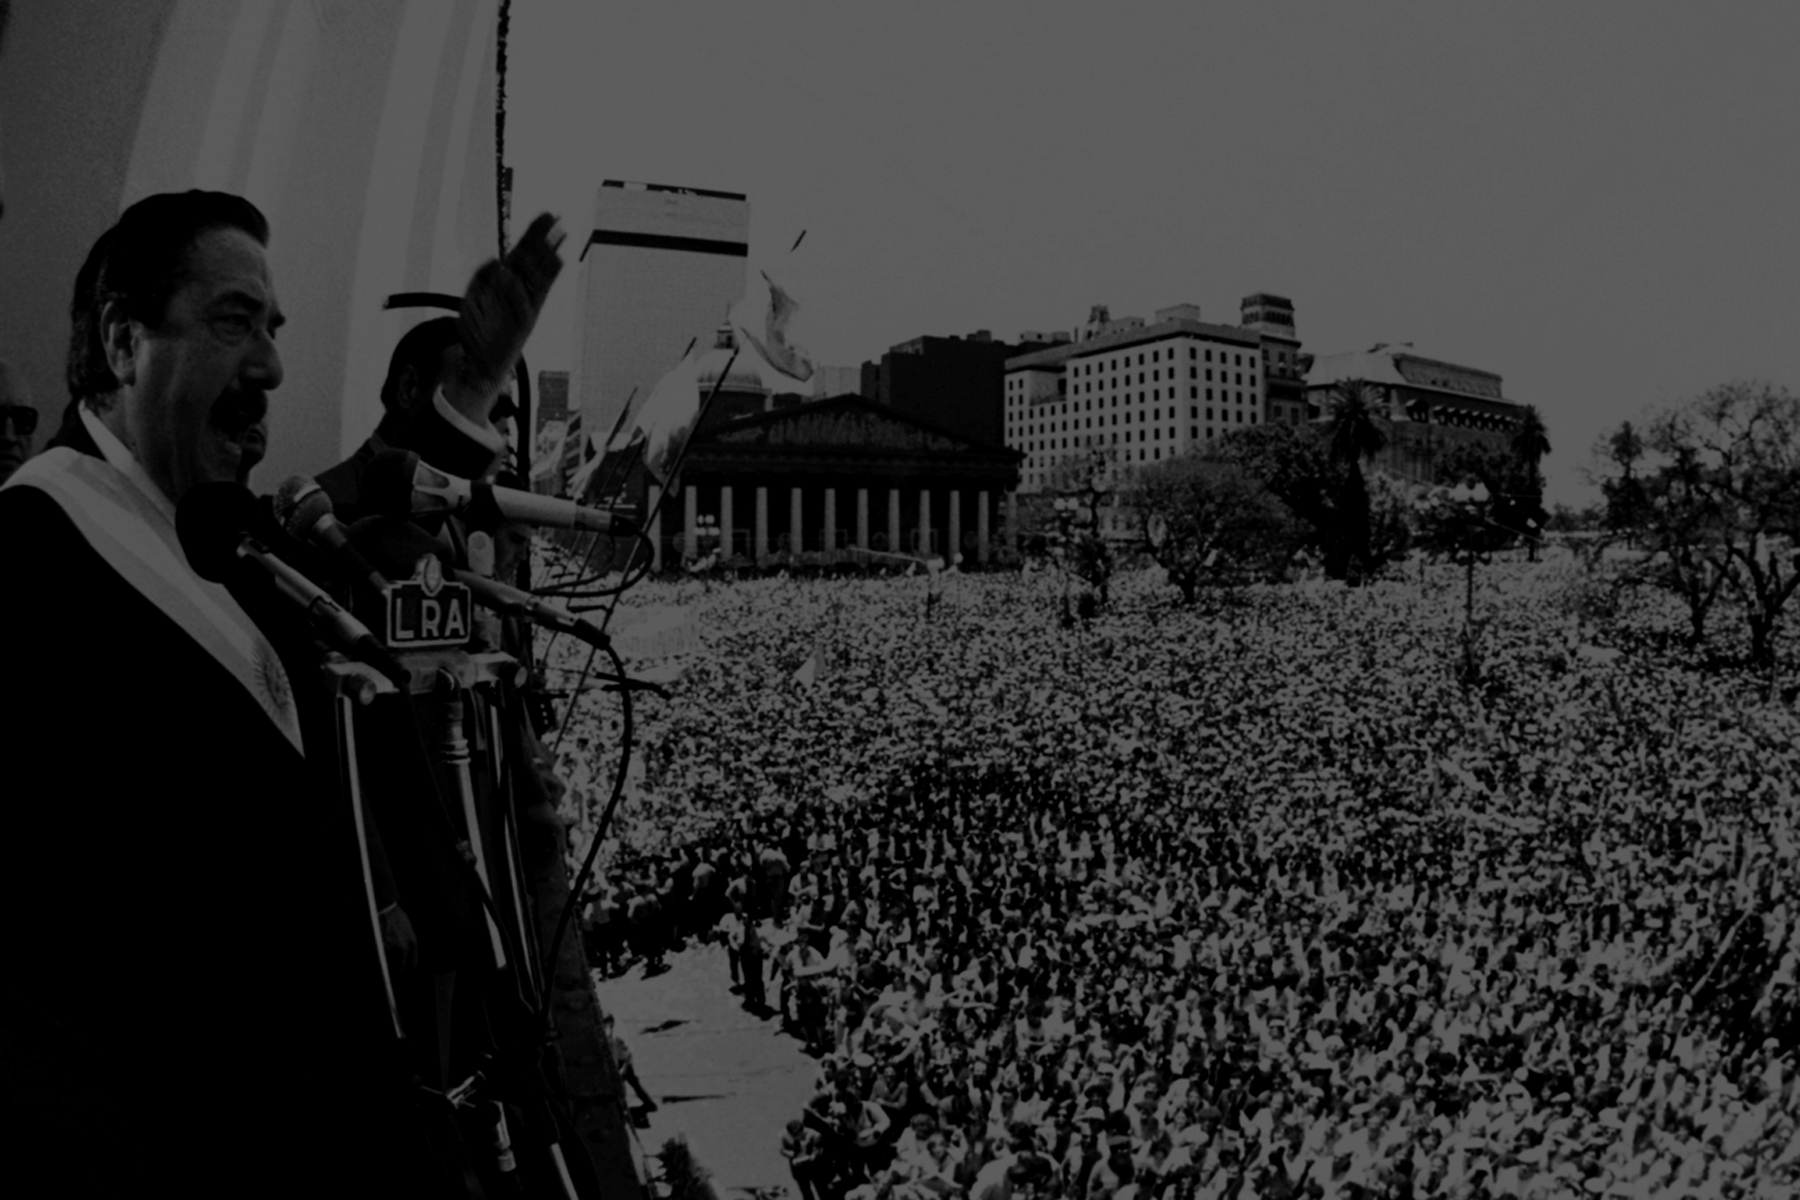 2009 - Diego García - Militante radical